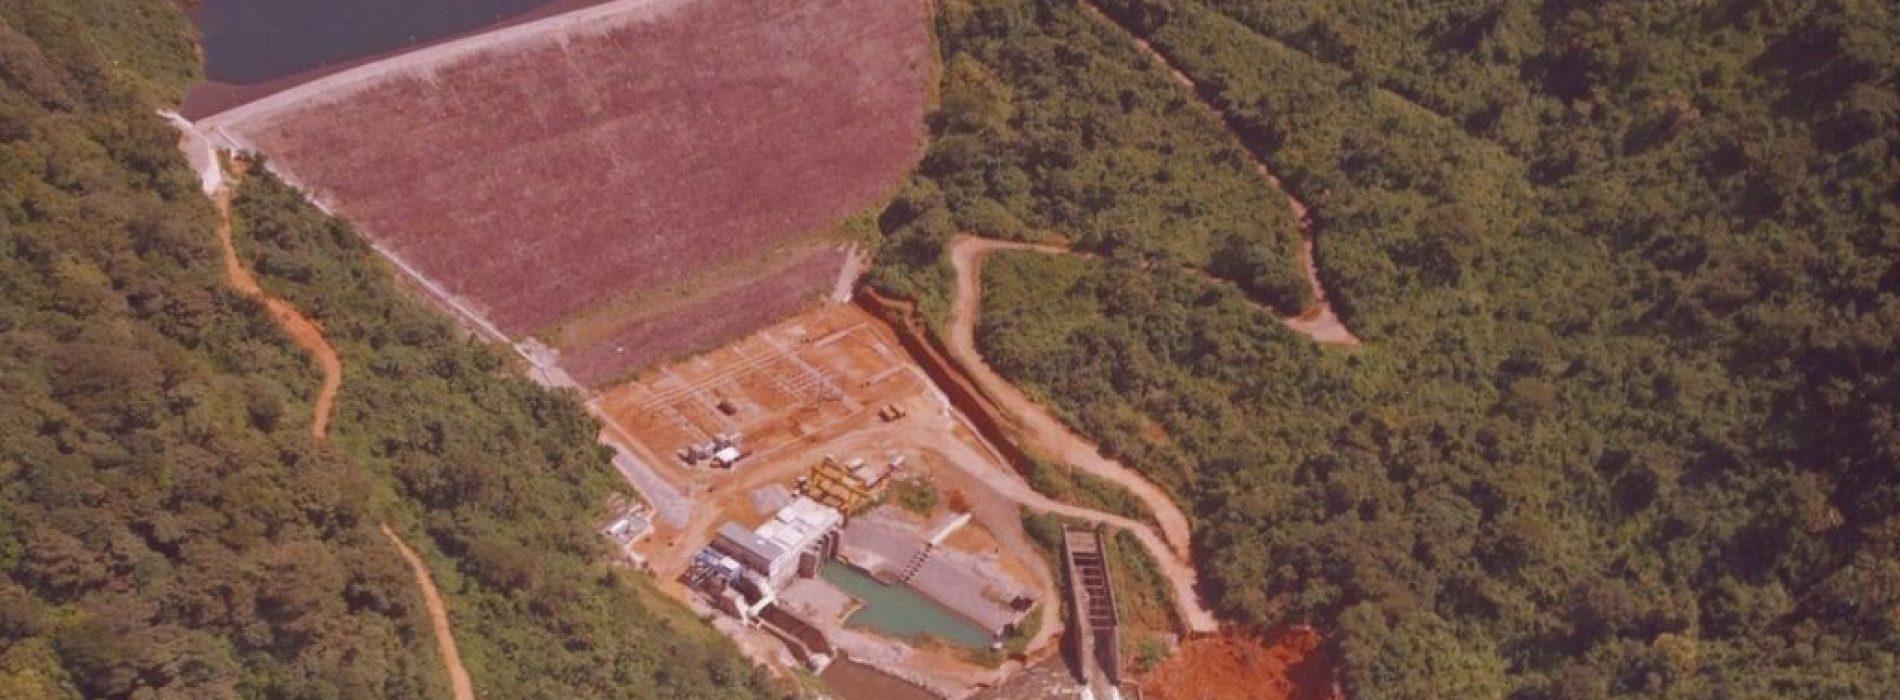 Sierra Leone: Joule Africa ottiene 6 milioni di dollari da InfraCo per la diga Bumbuna II (143 MW)